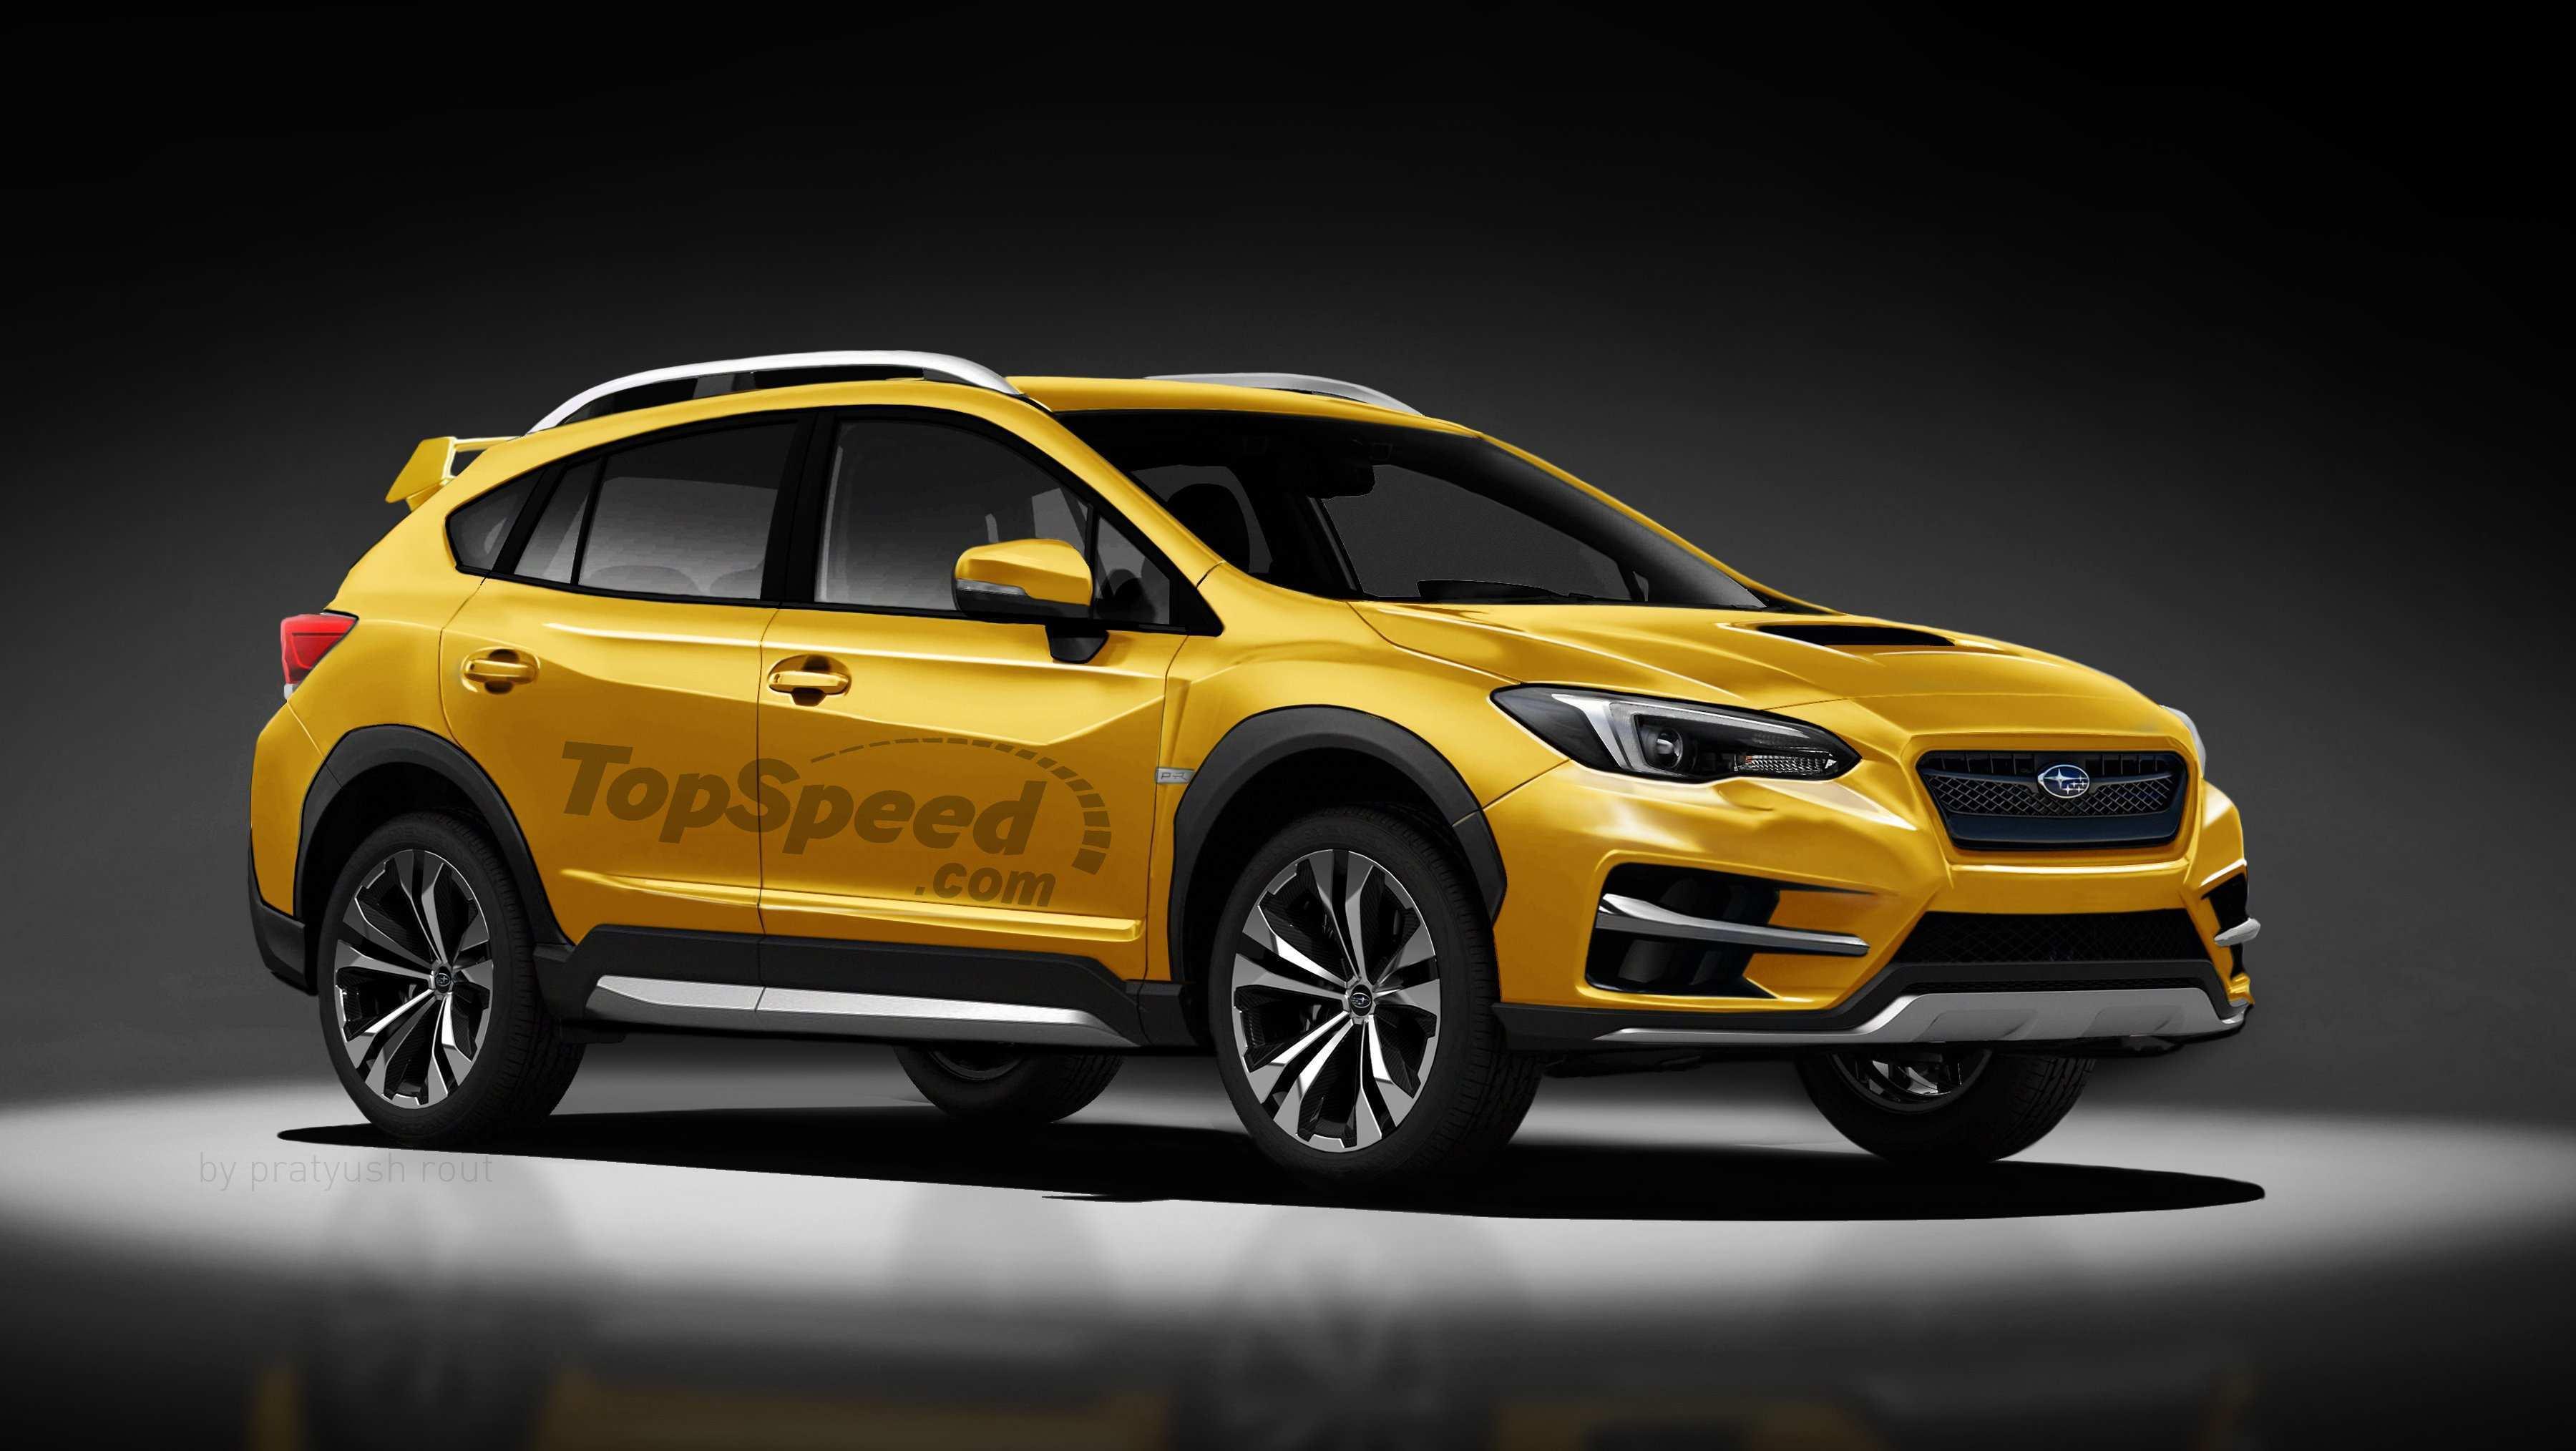 58 New Subaru Xv 2020 New Concept Spy Shoot with Subaru Xv 2020 New Concept